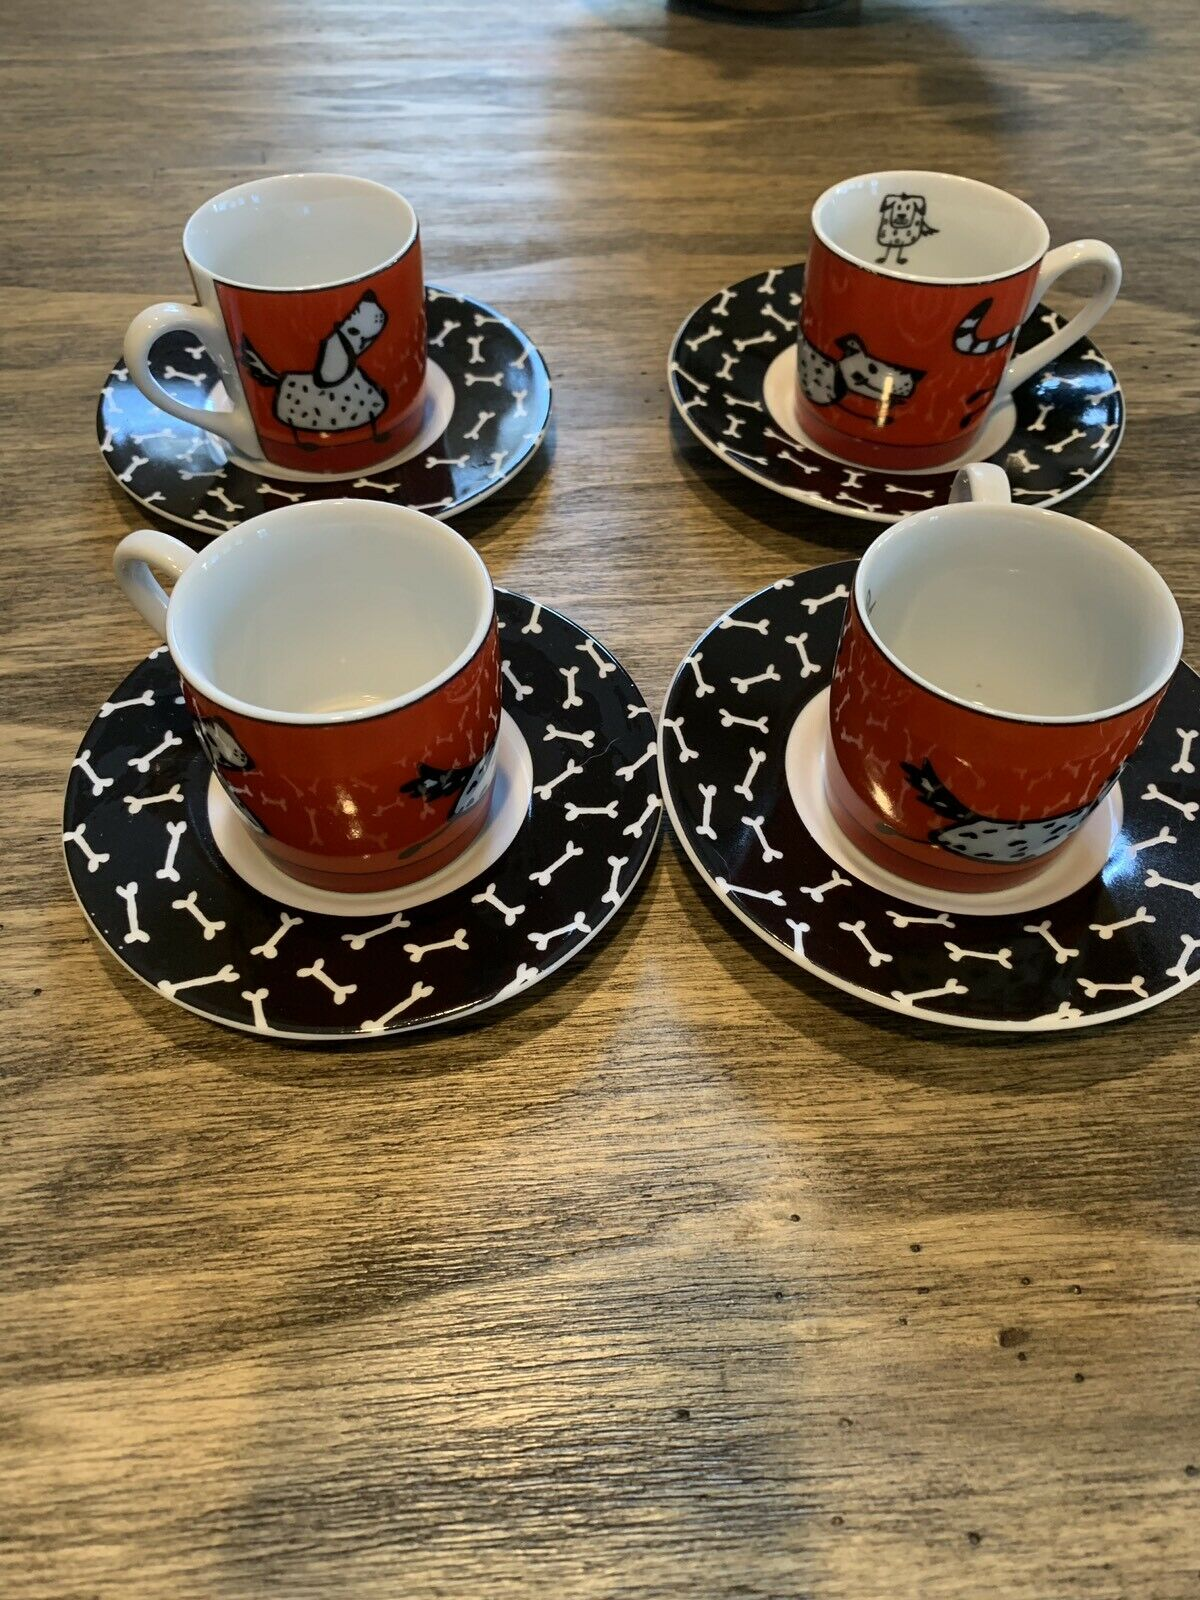 KONITZ Espresso Mugs Saucers Dogs Chasing Cats Bones Set Of 4 Four